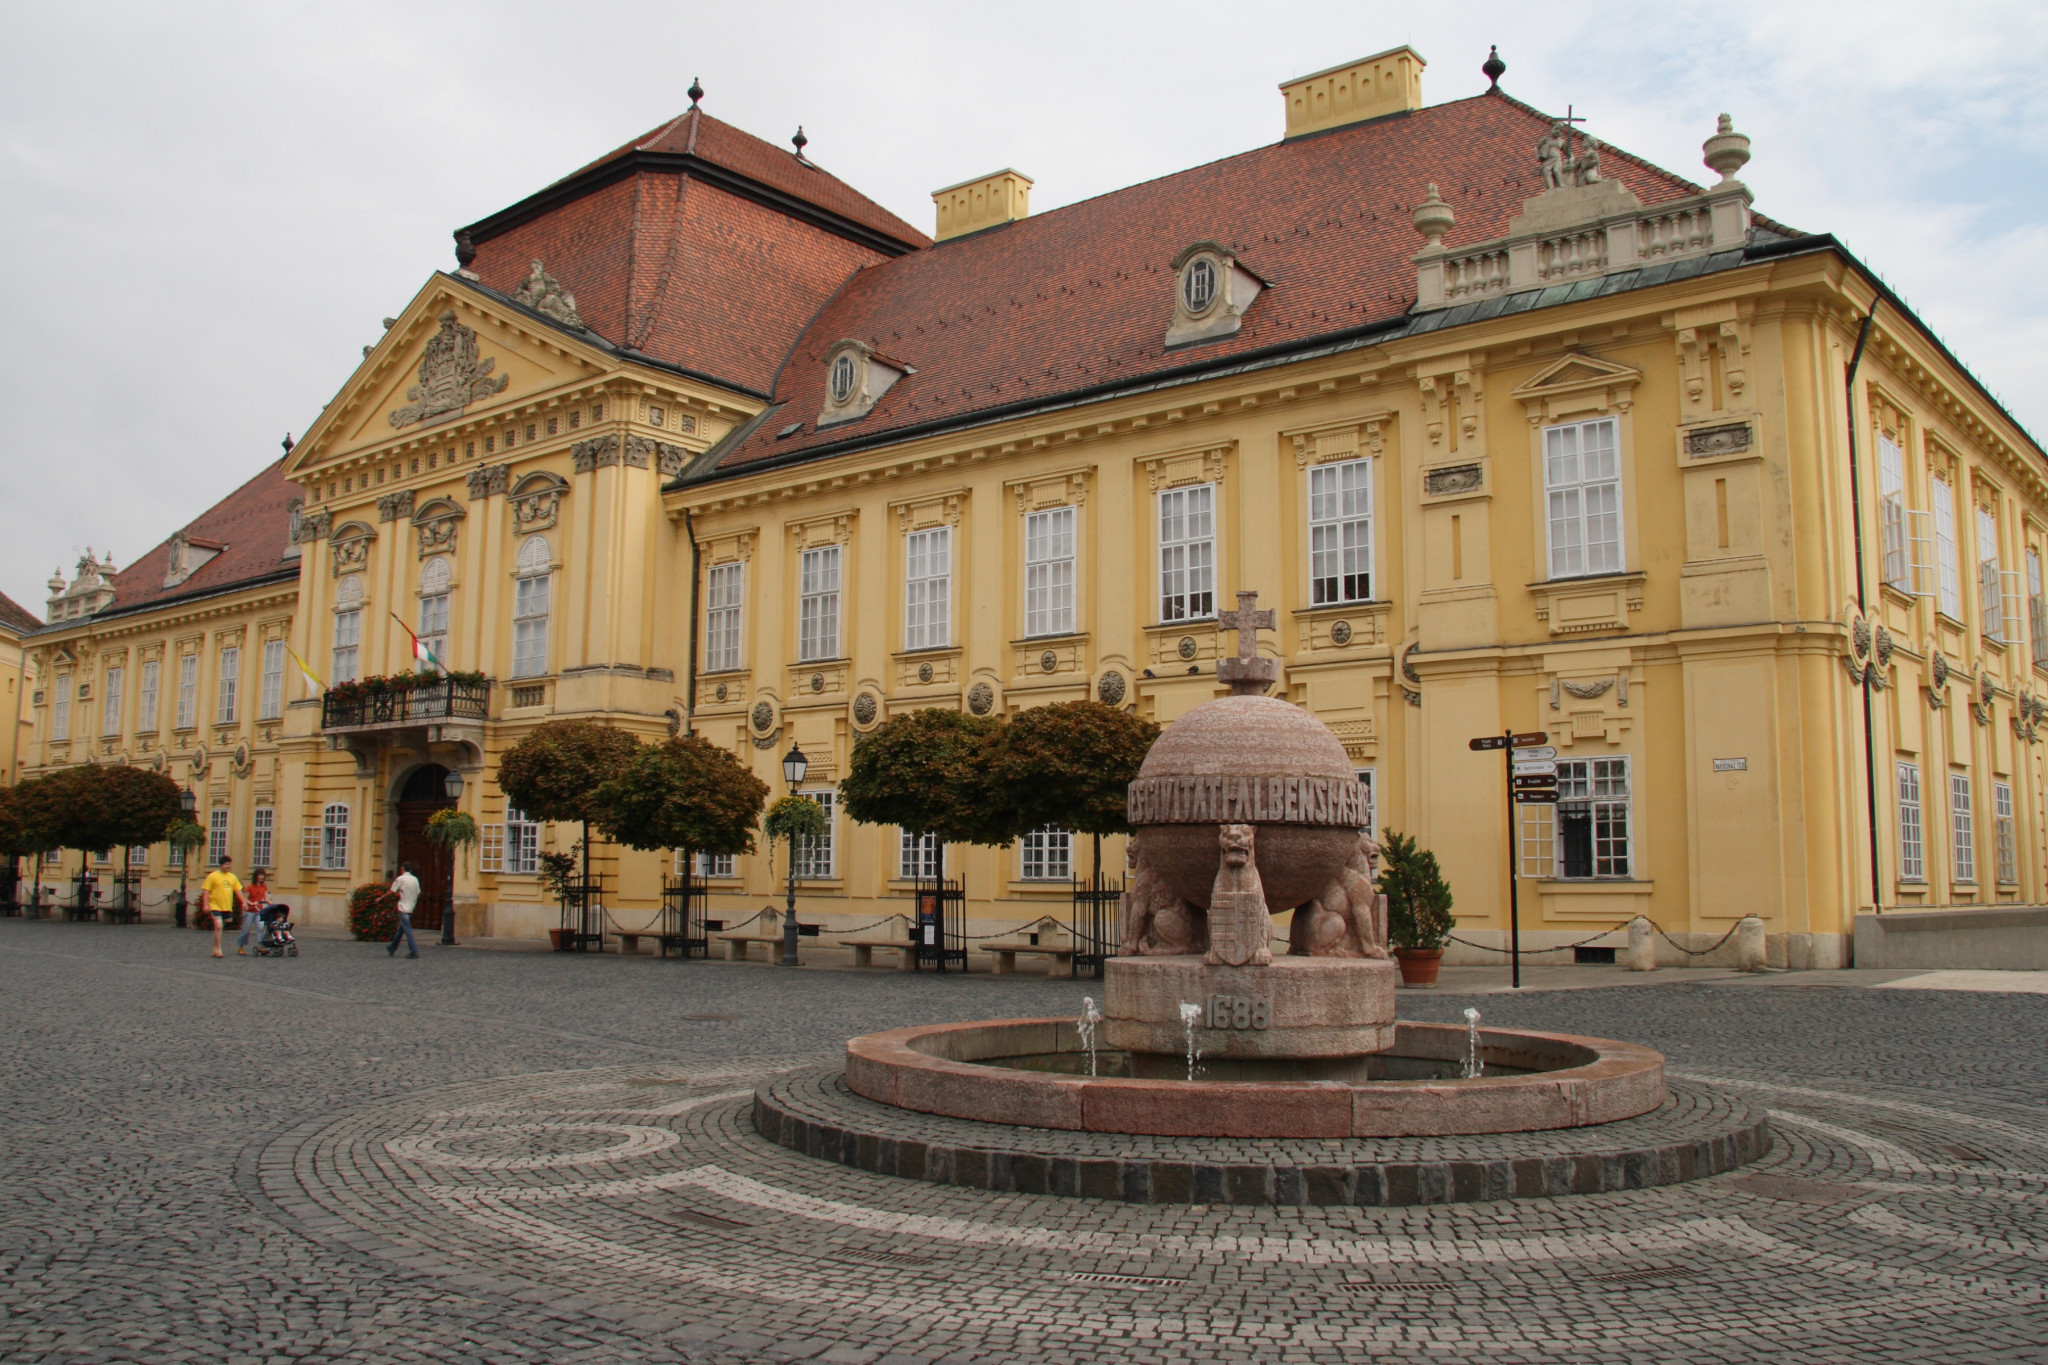 Székesfehérvár will now host the European Modern Pentathlon Championships in 2022 ©Wikipedia